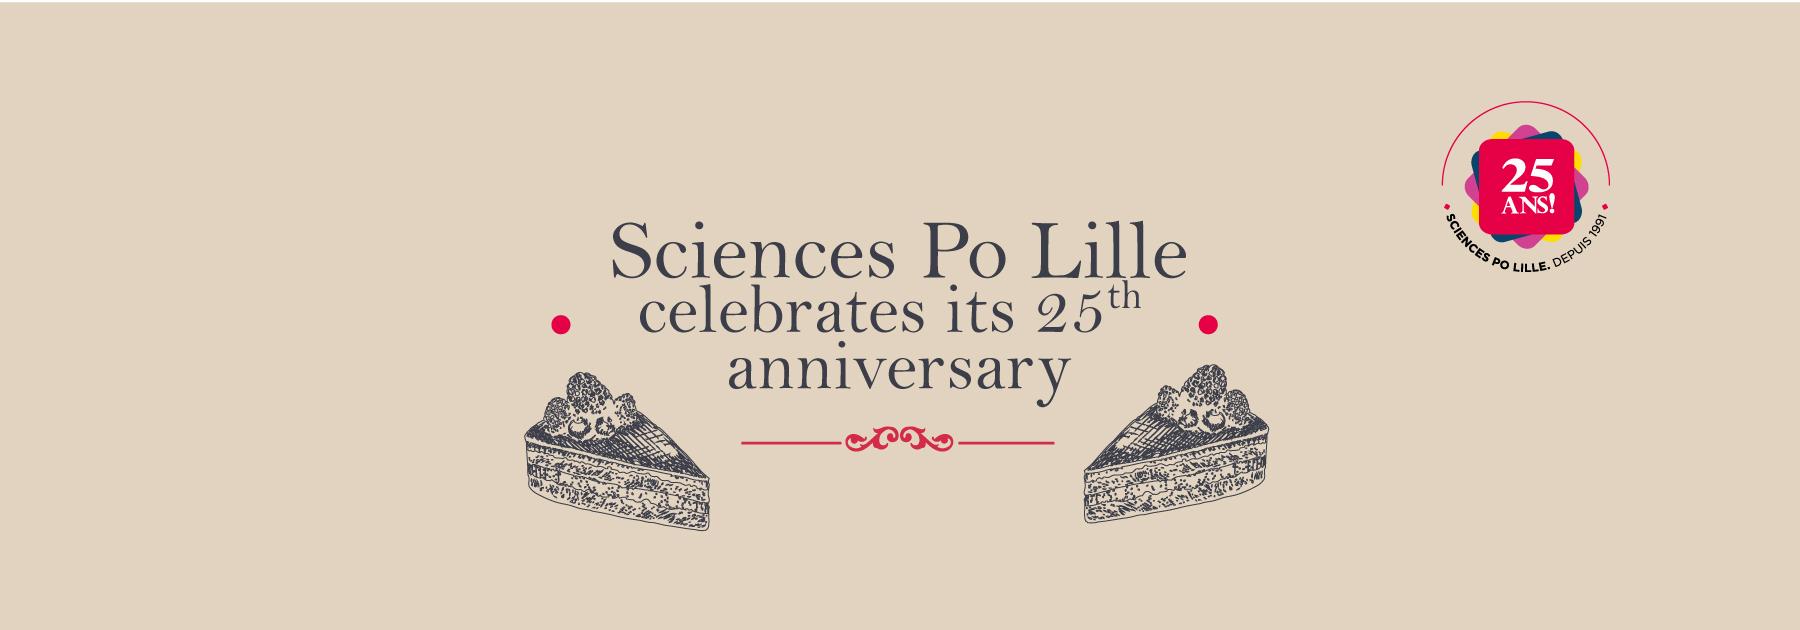 Sciences Po Lille' birthday